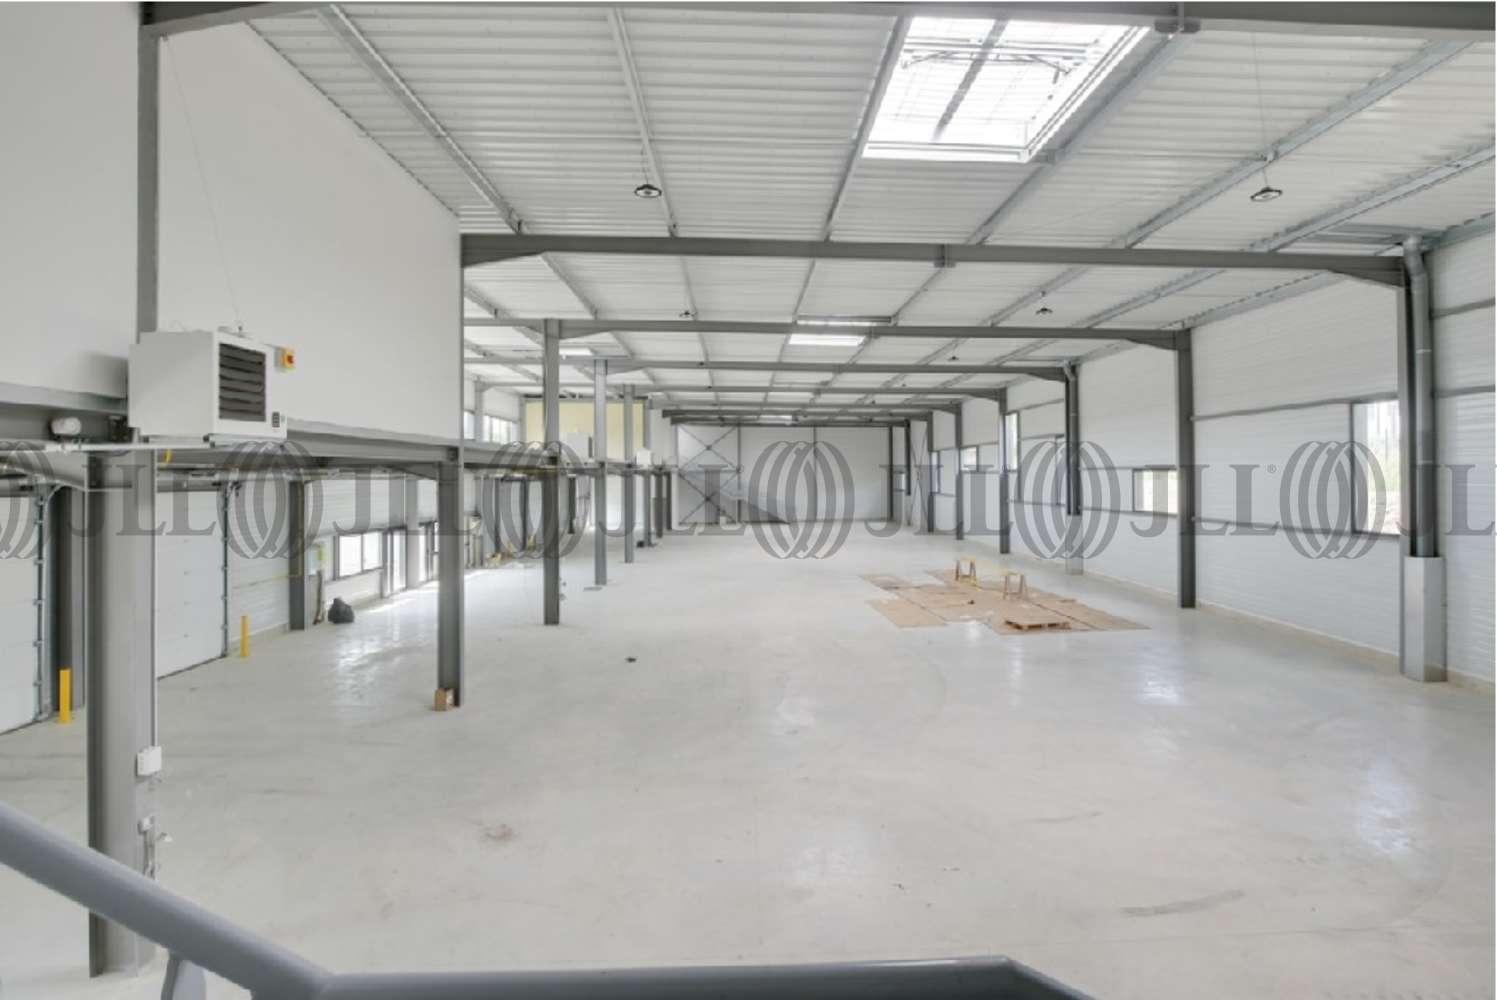 Activités/entrepôt Aulnay sous bois, 93600